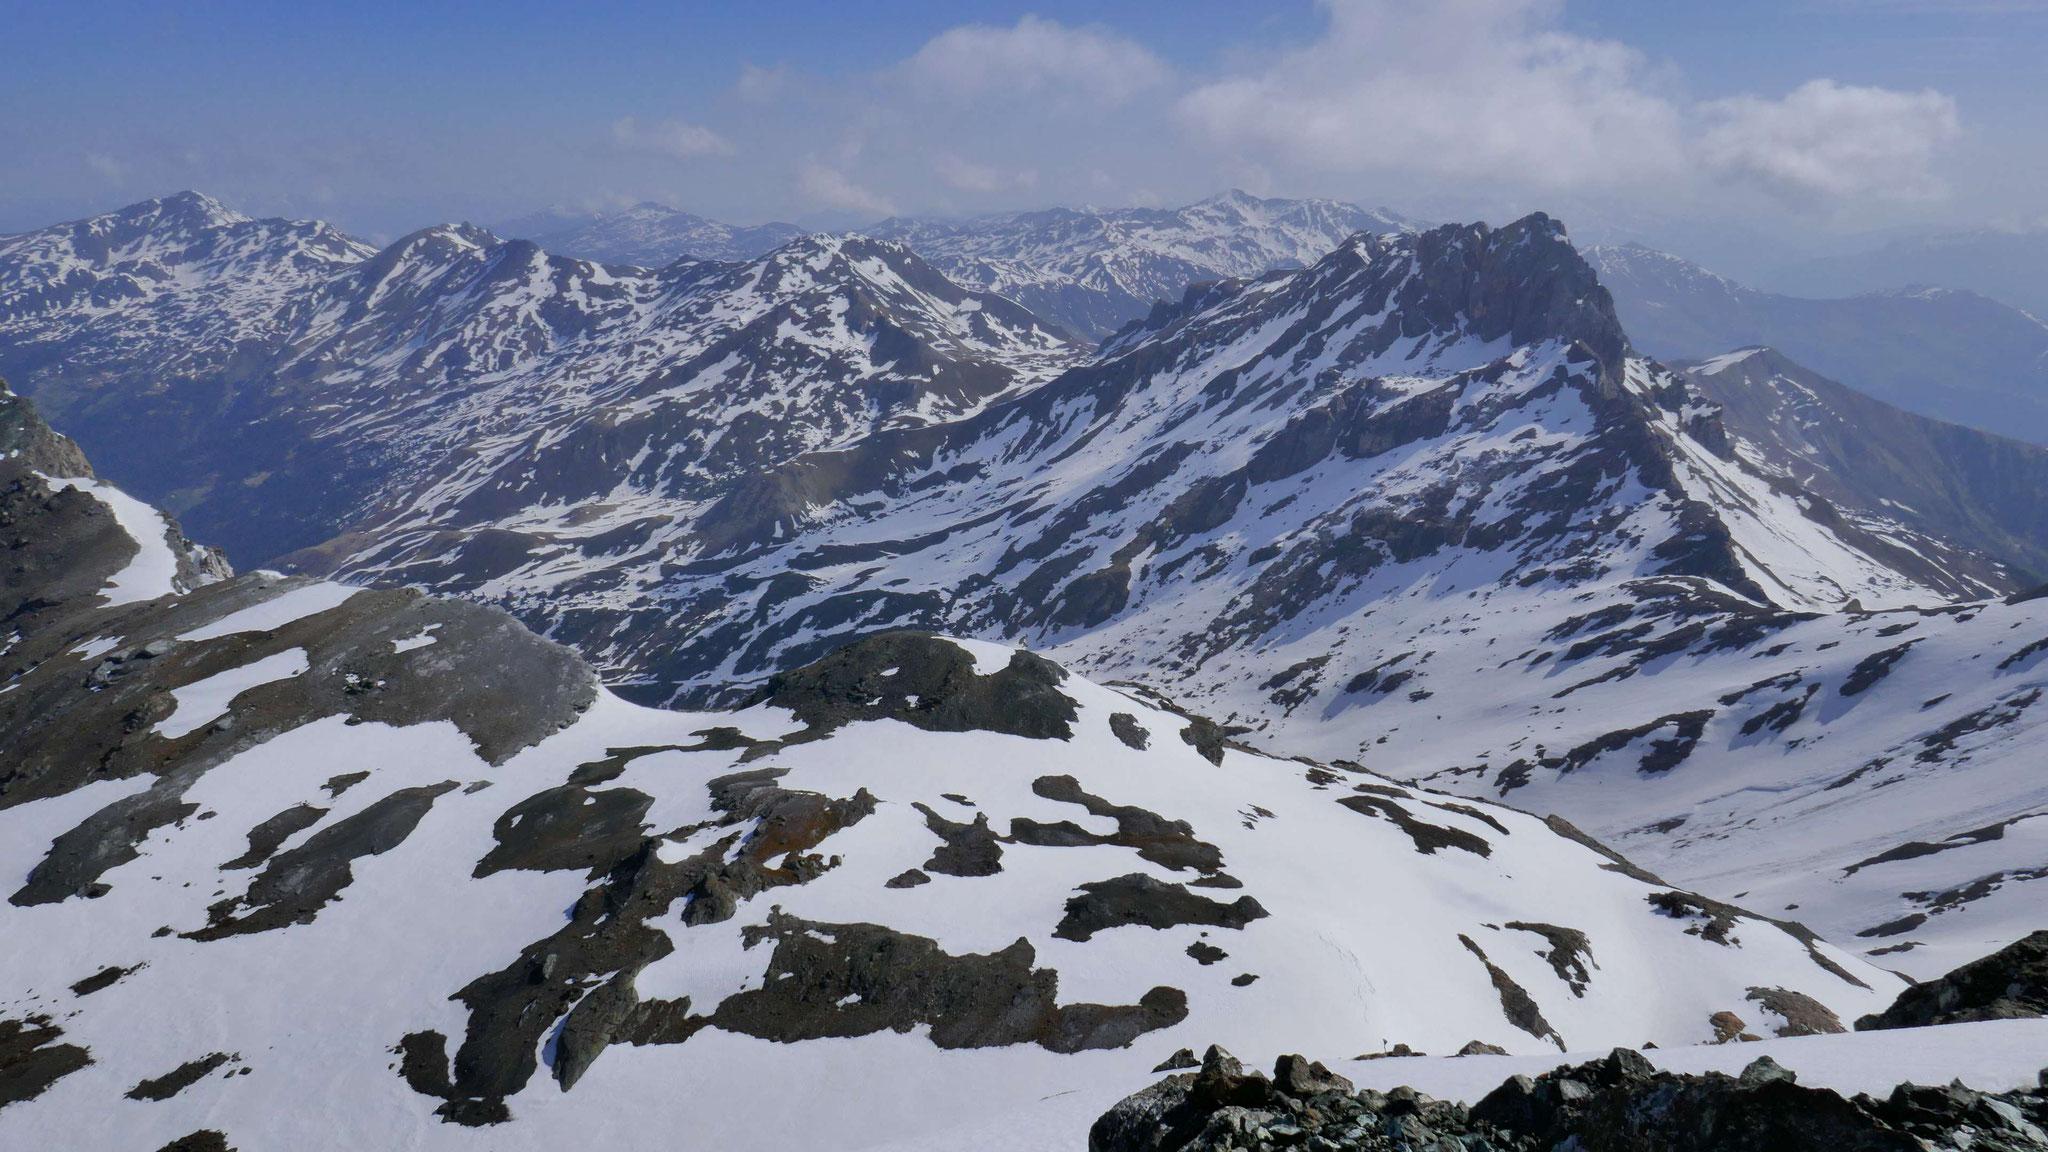 Hintere Wattentaler Lizum mit Kalkwand - Torspitze - Hippoldspitze - Hirzer